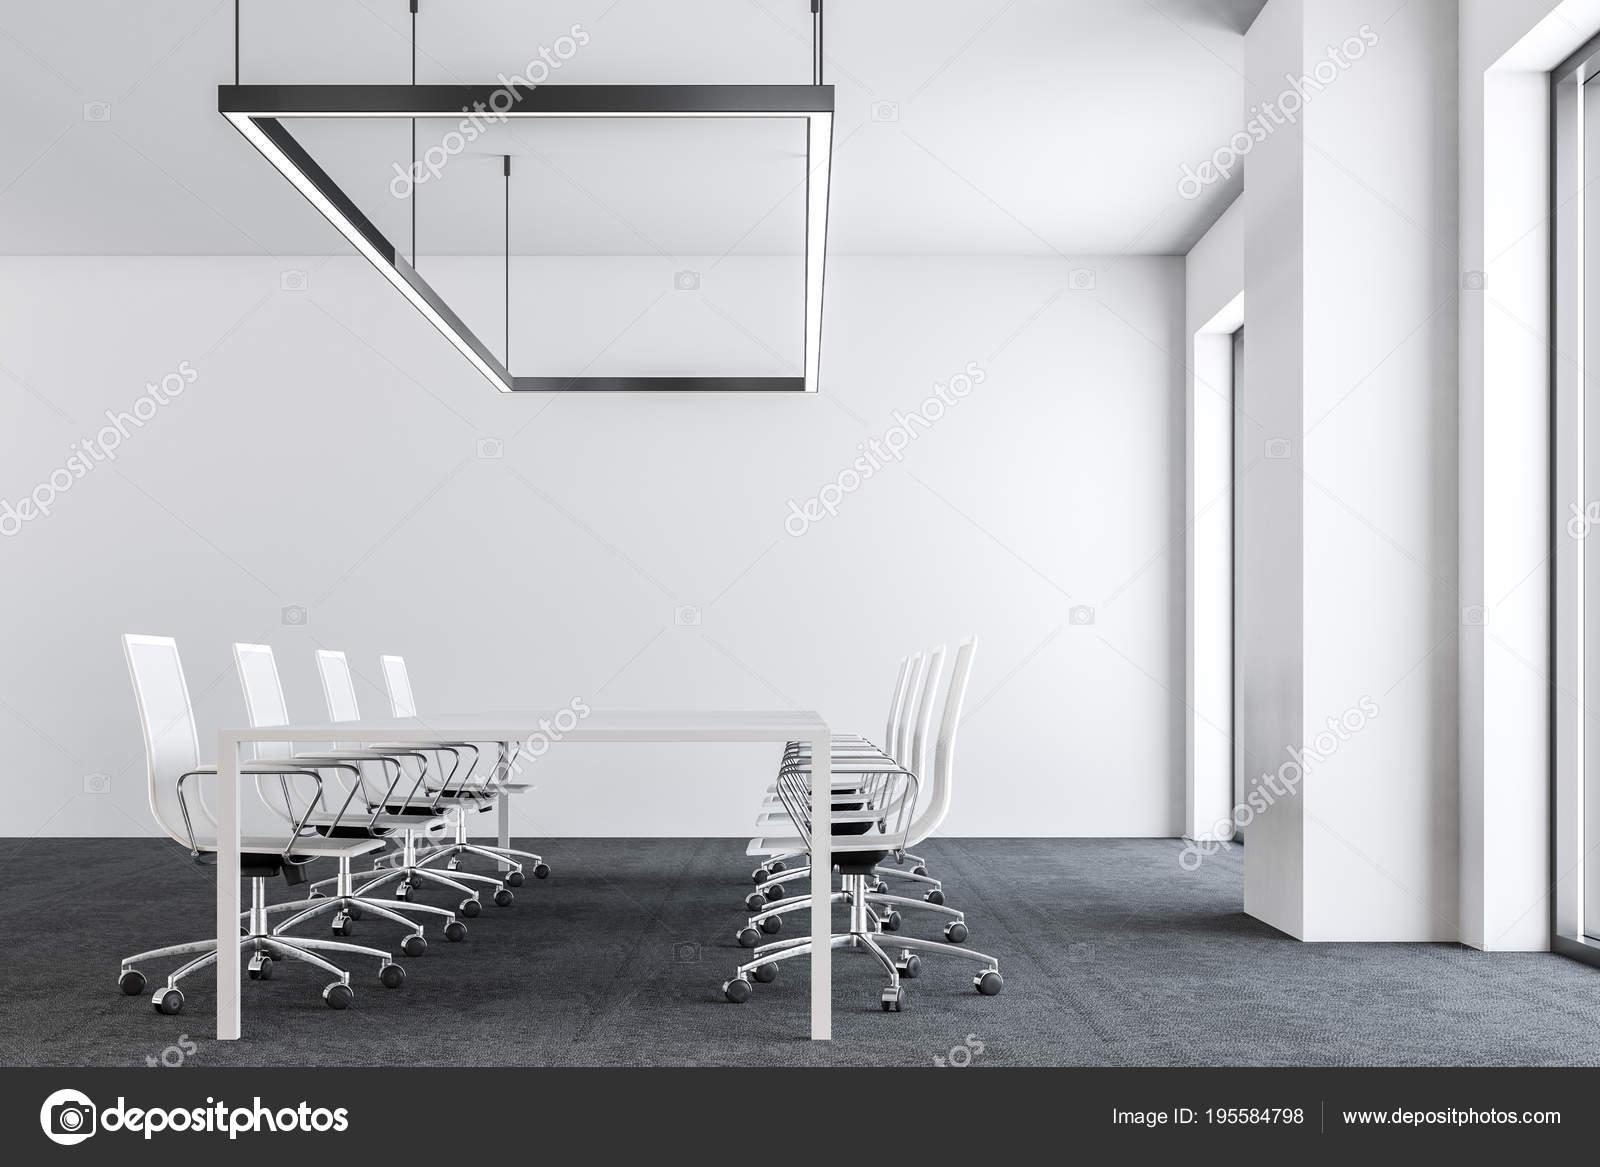 Picture of: White Ultra Modern Office Meeting Room Stock Photo C Denisismagilov 195584798